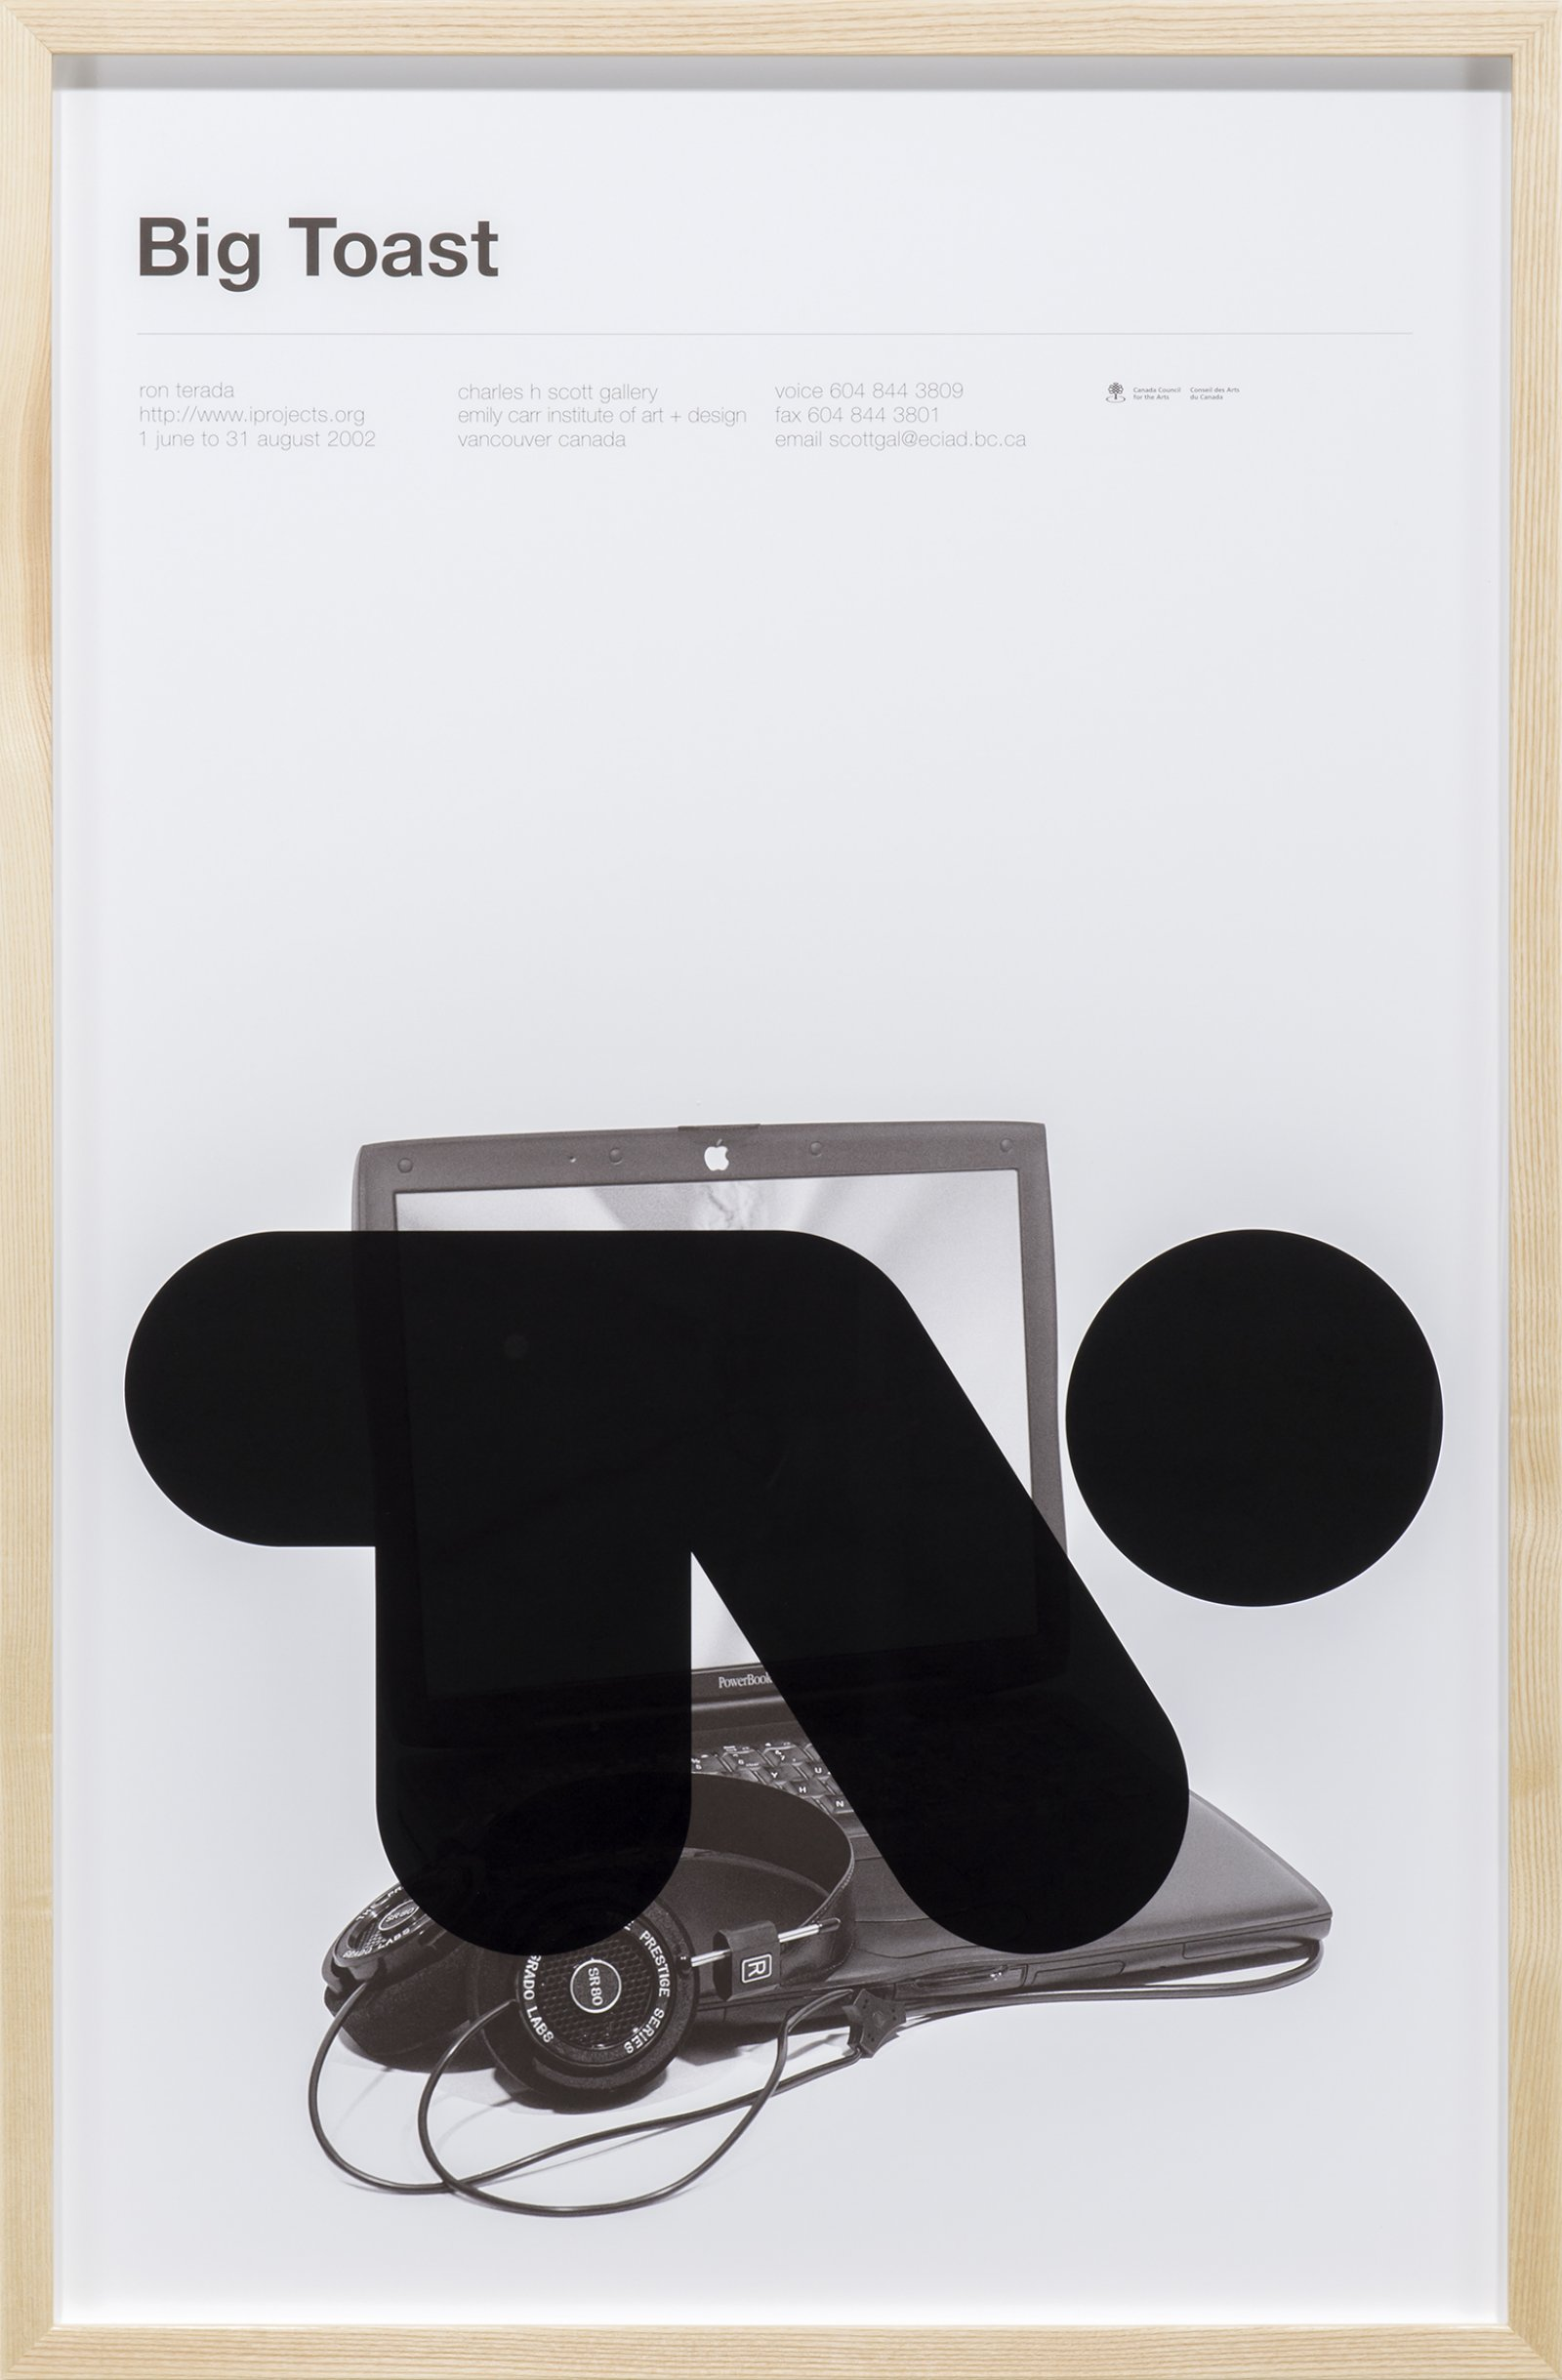 Ron Terada, Big Toast Logo #10, 2016, inkjet print on offset printed poster, 34 x 22 in. (86 x 56 cm) by Ron Terada